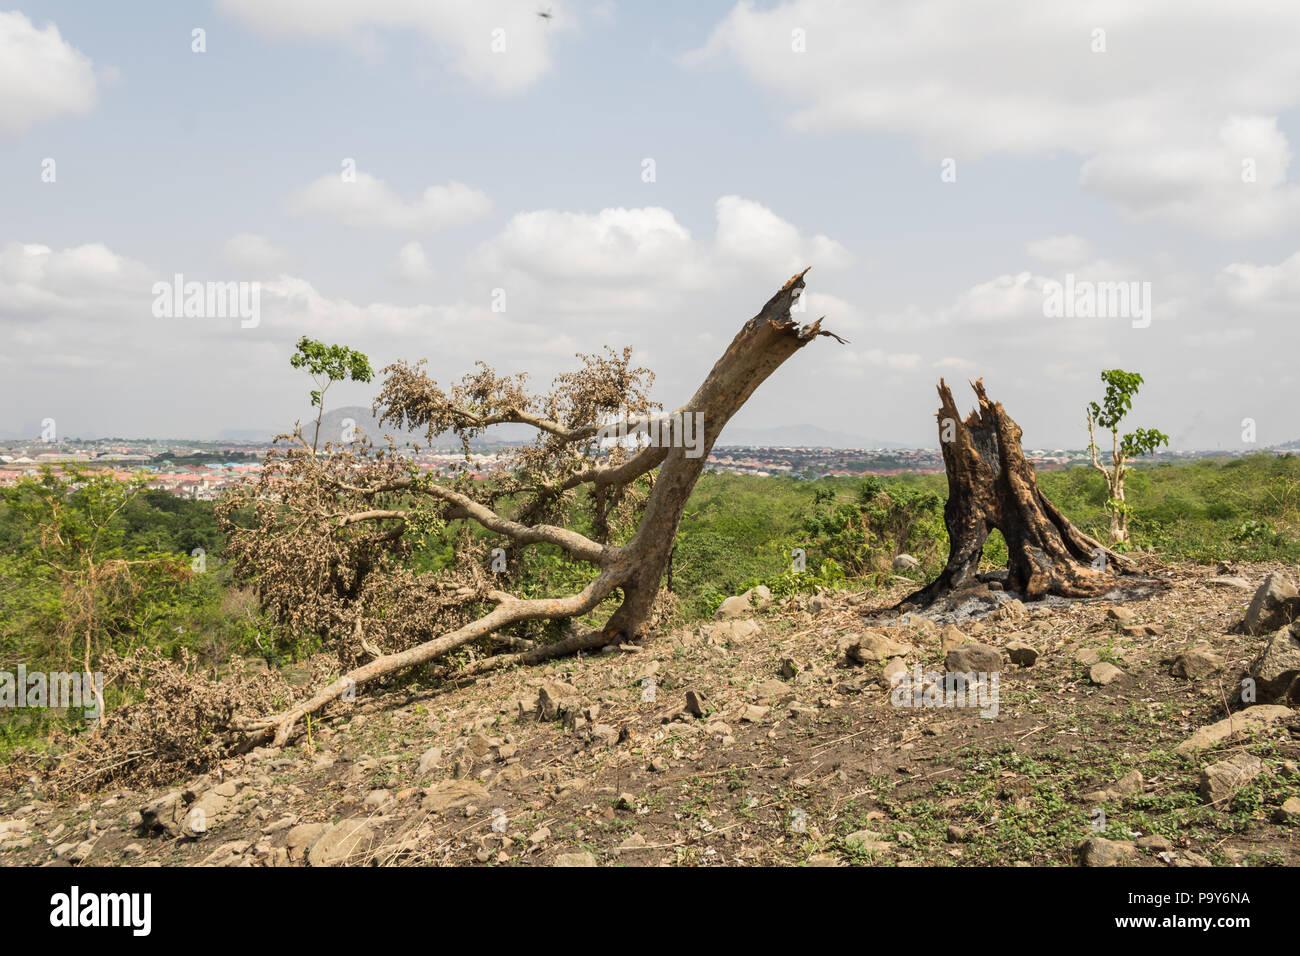 Deforestation by burning - Stock Image